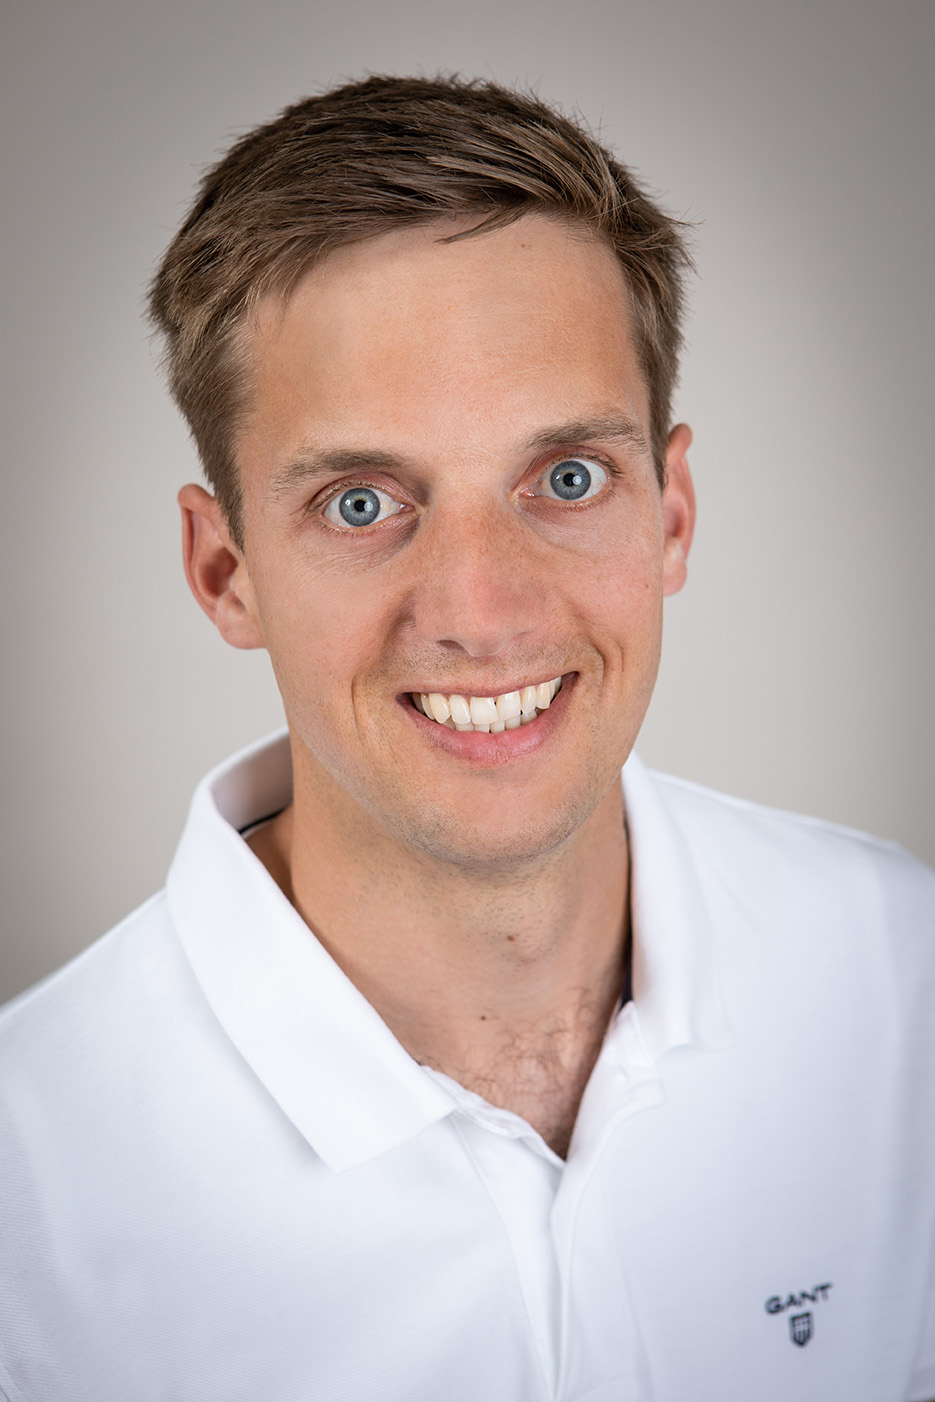 Dr. Sibbern Karsten Sibbersen